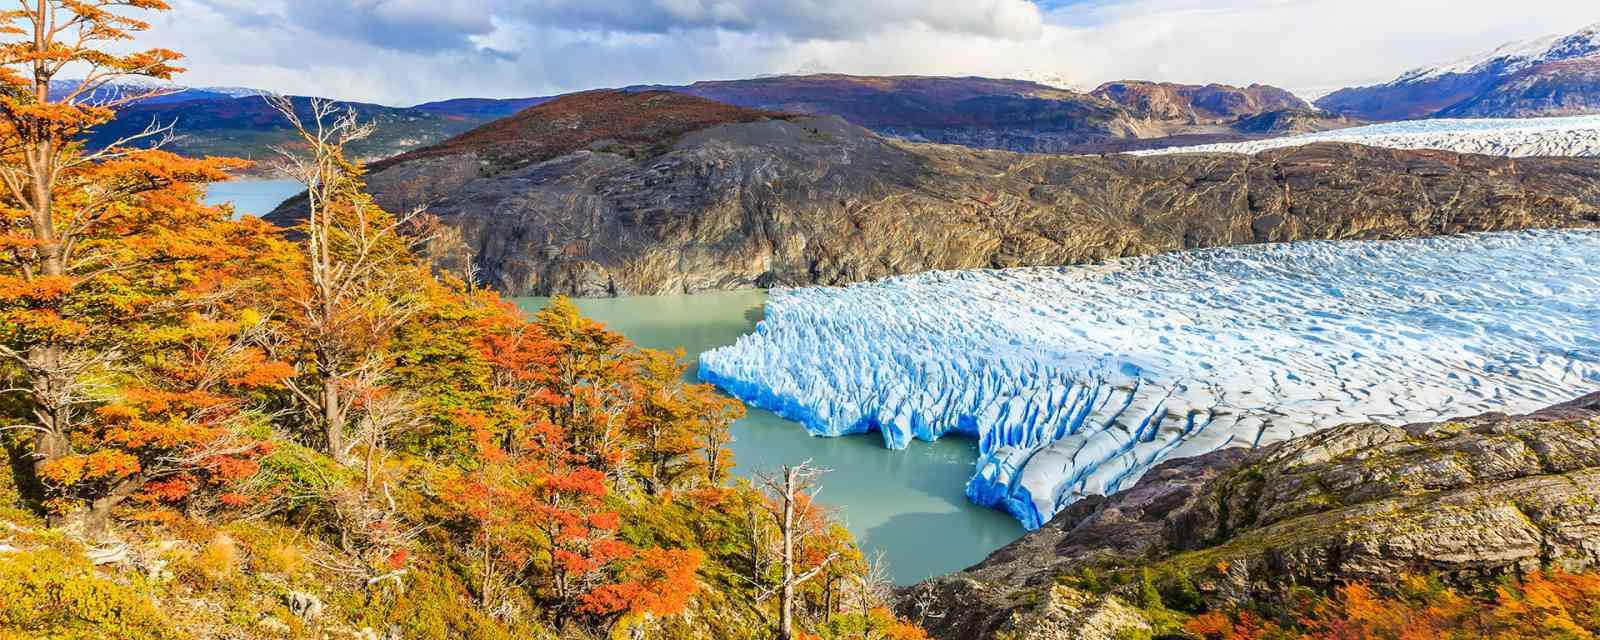 la patagonie chilienne